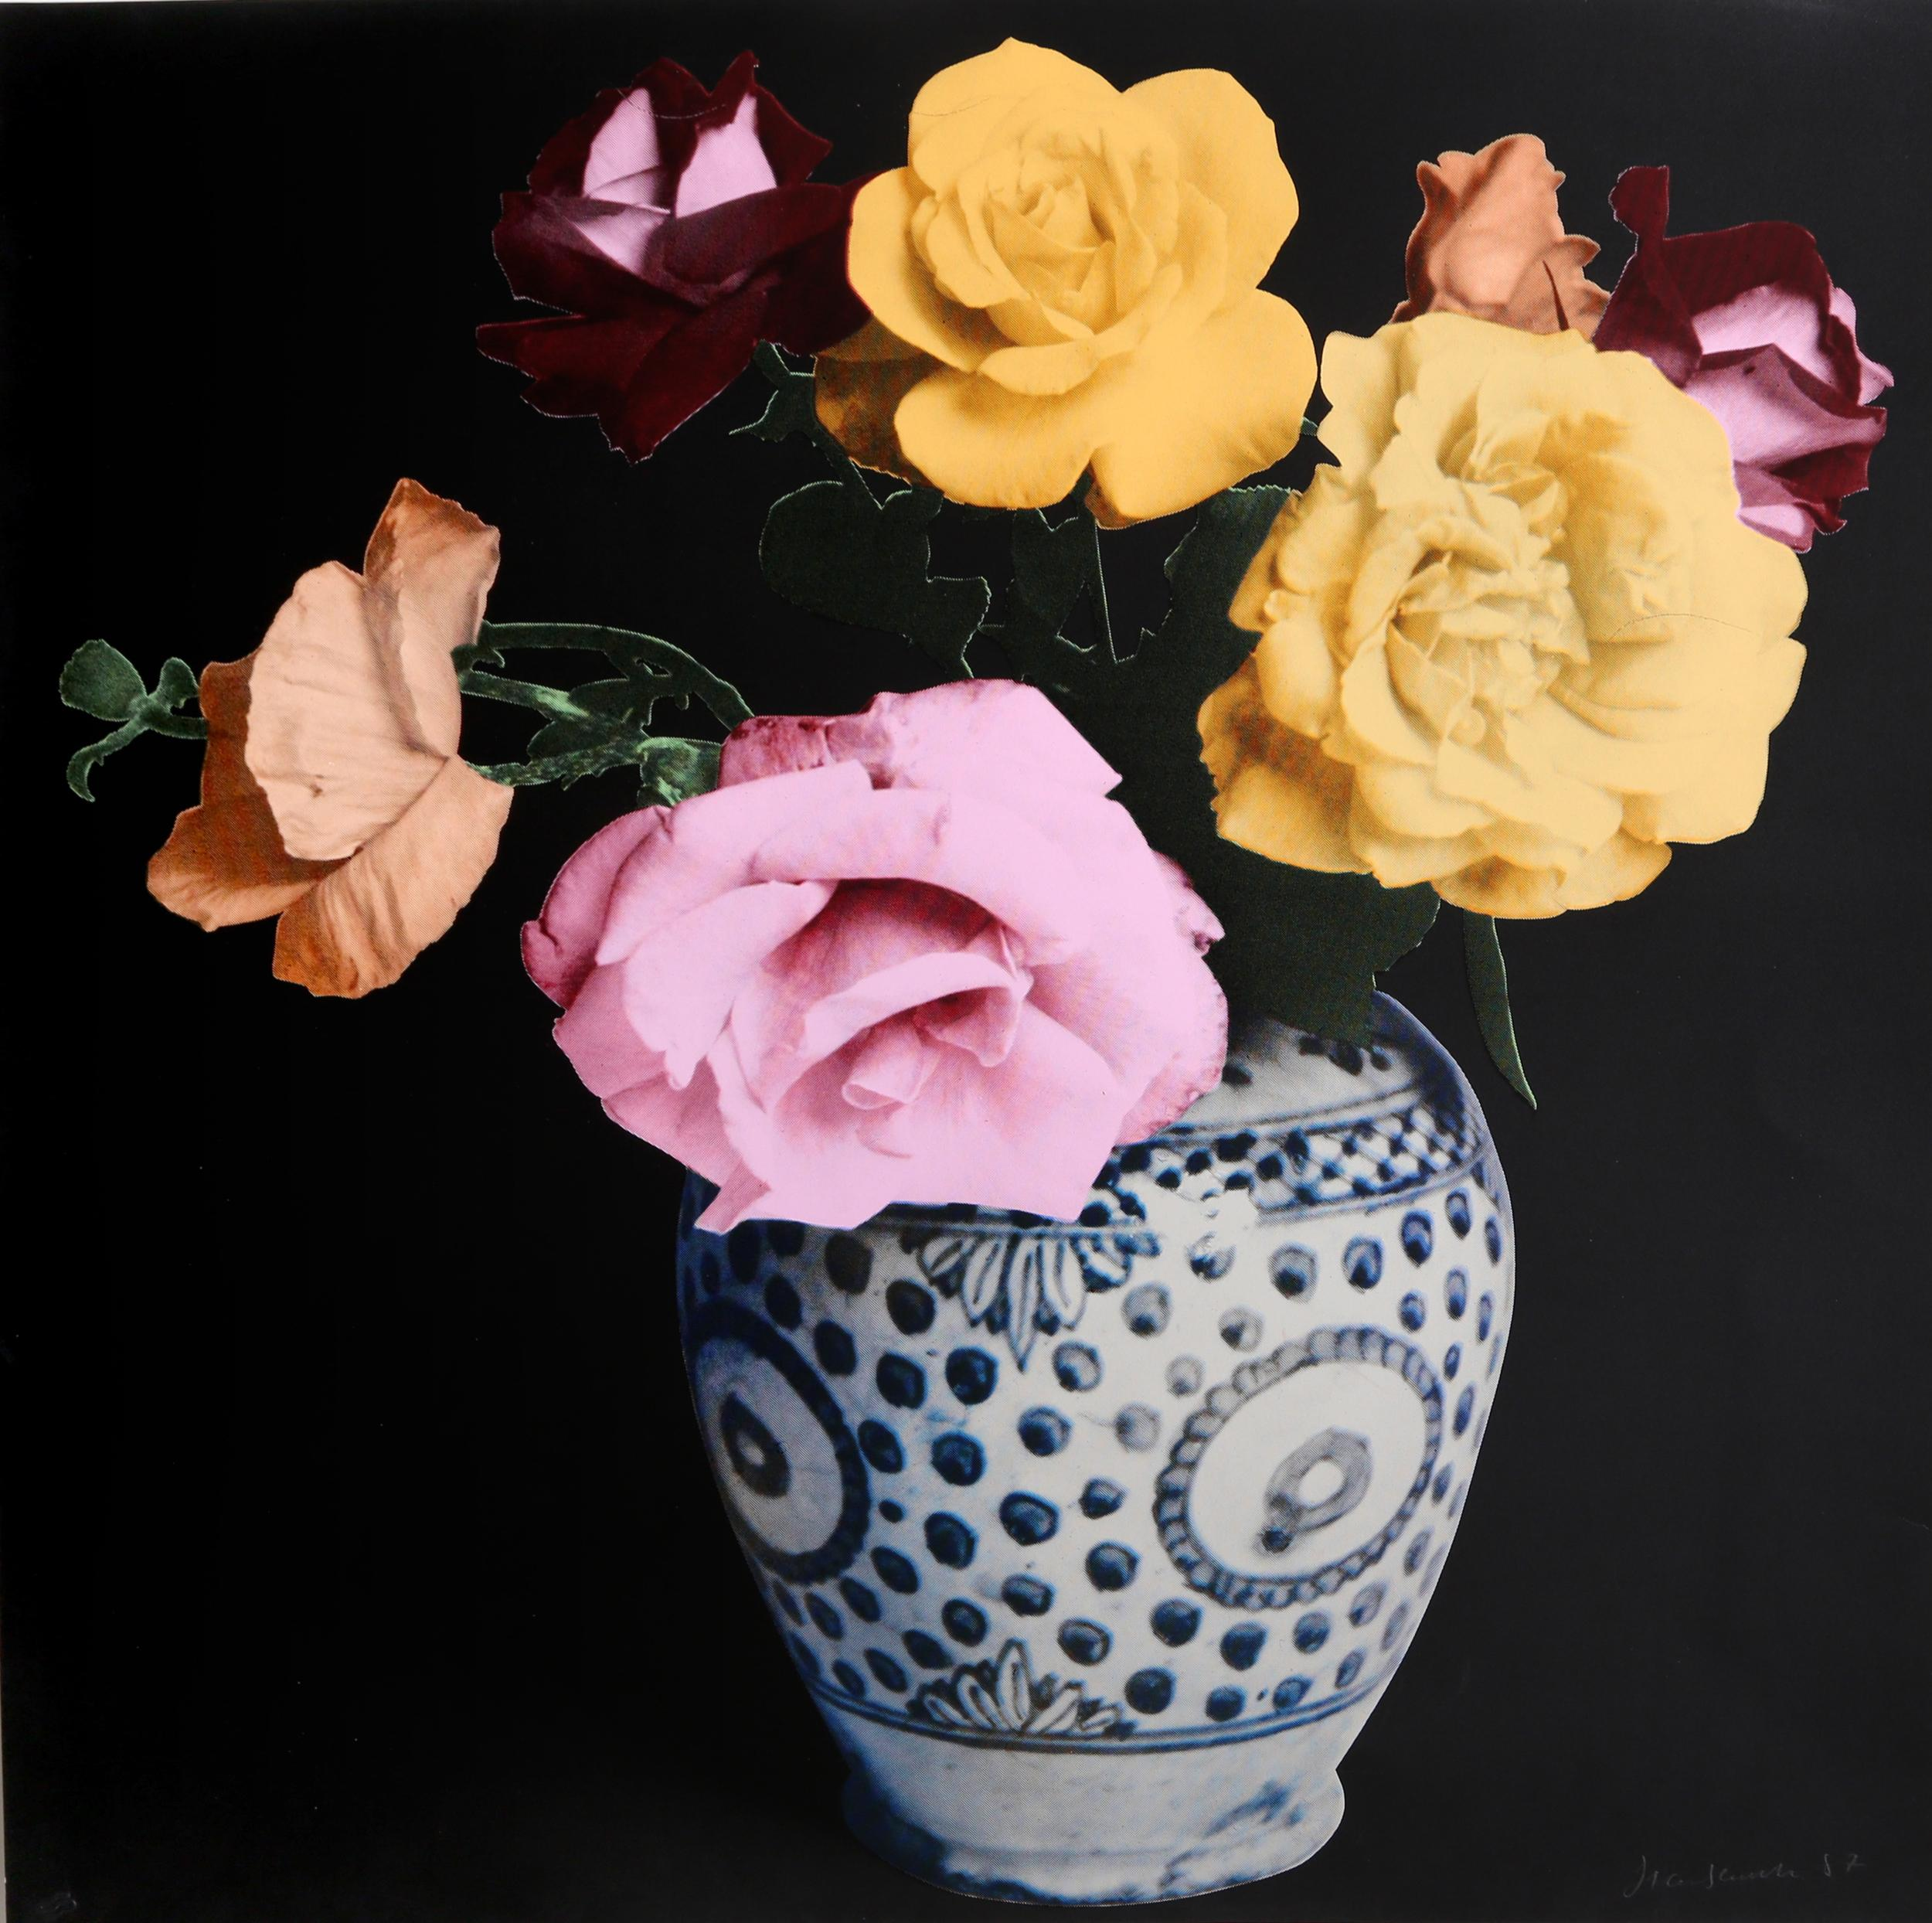 Francesco Scavullo, Flower Arrangement (Black), Screenprint